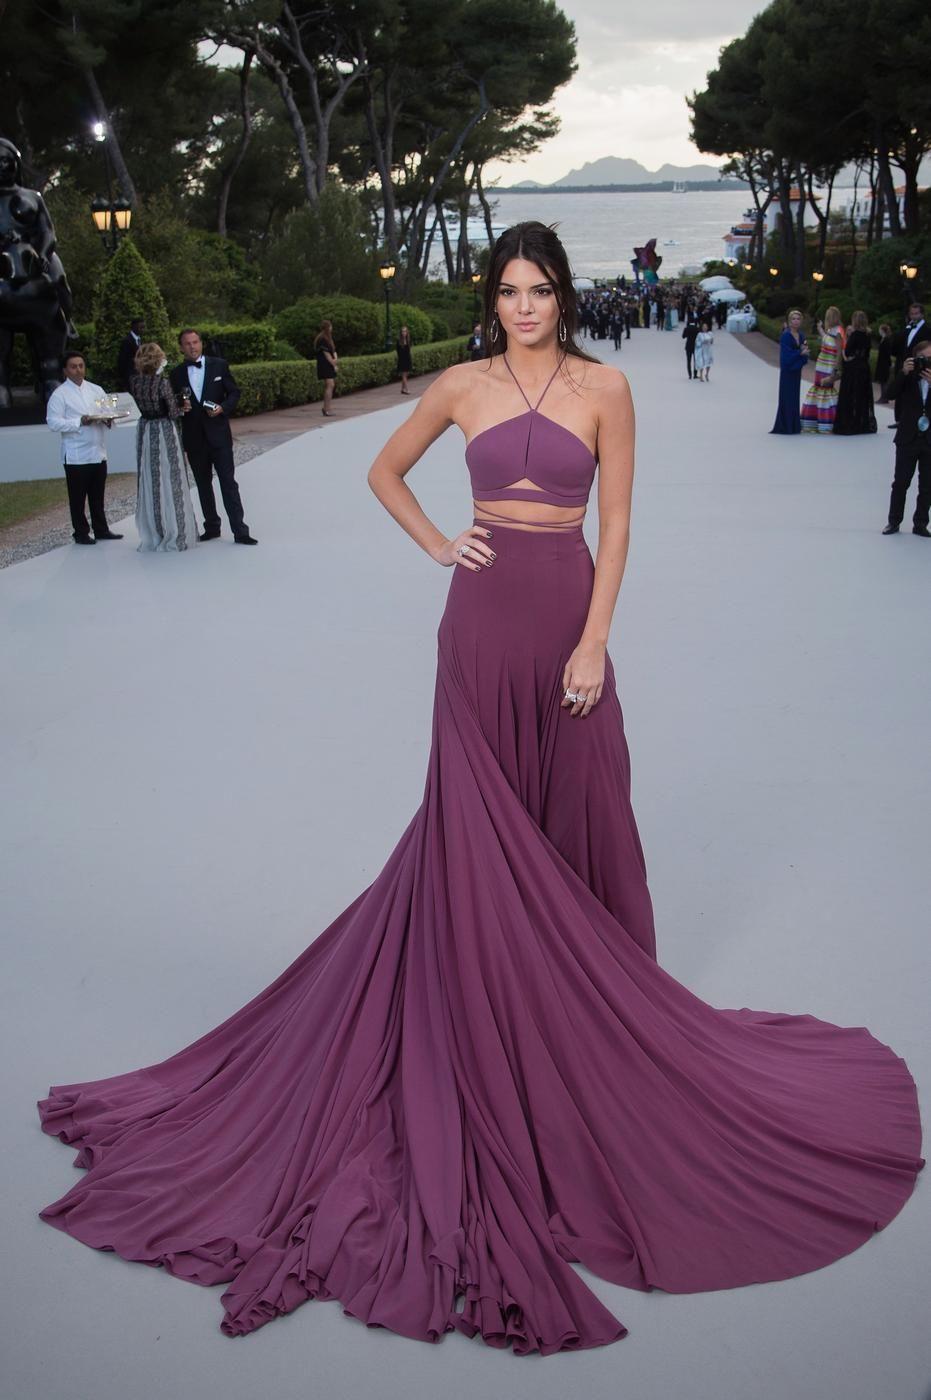 Kendall Jenner just won the Cannes red carpet | Vestidos de fiesta ...